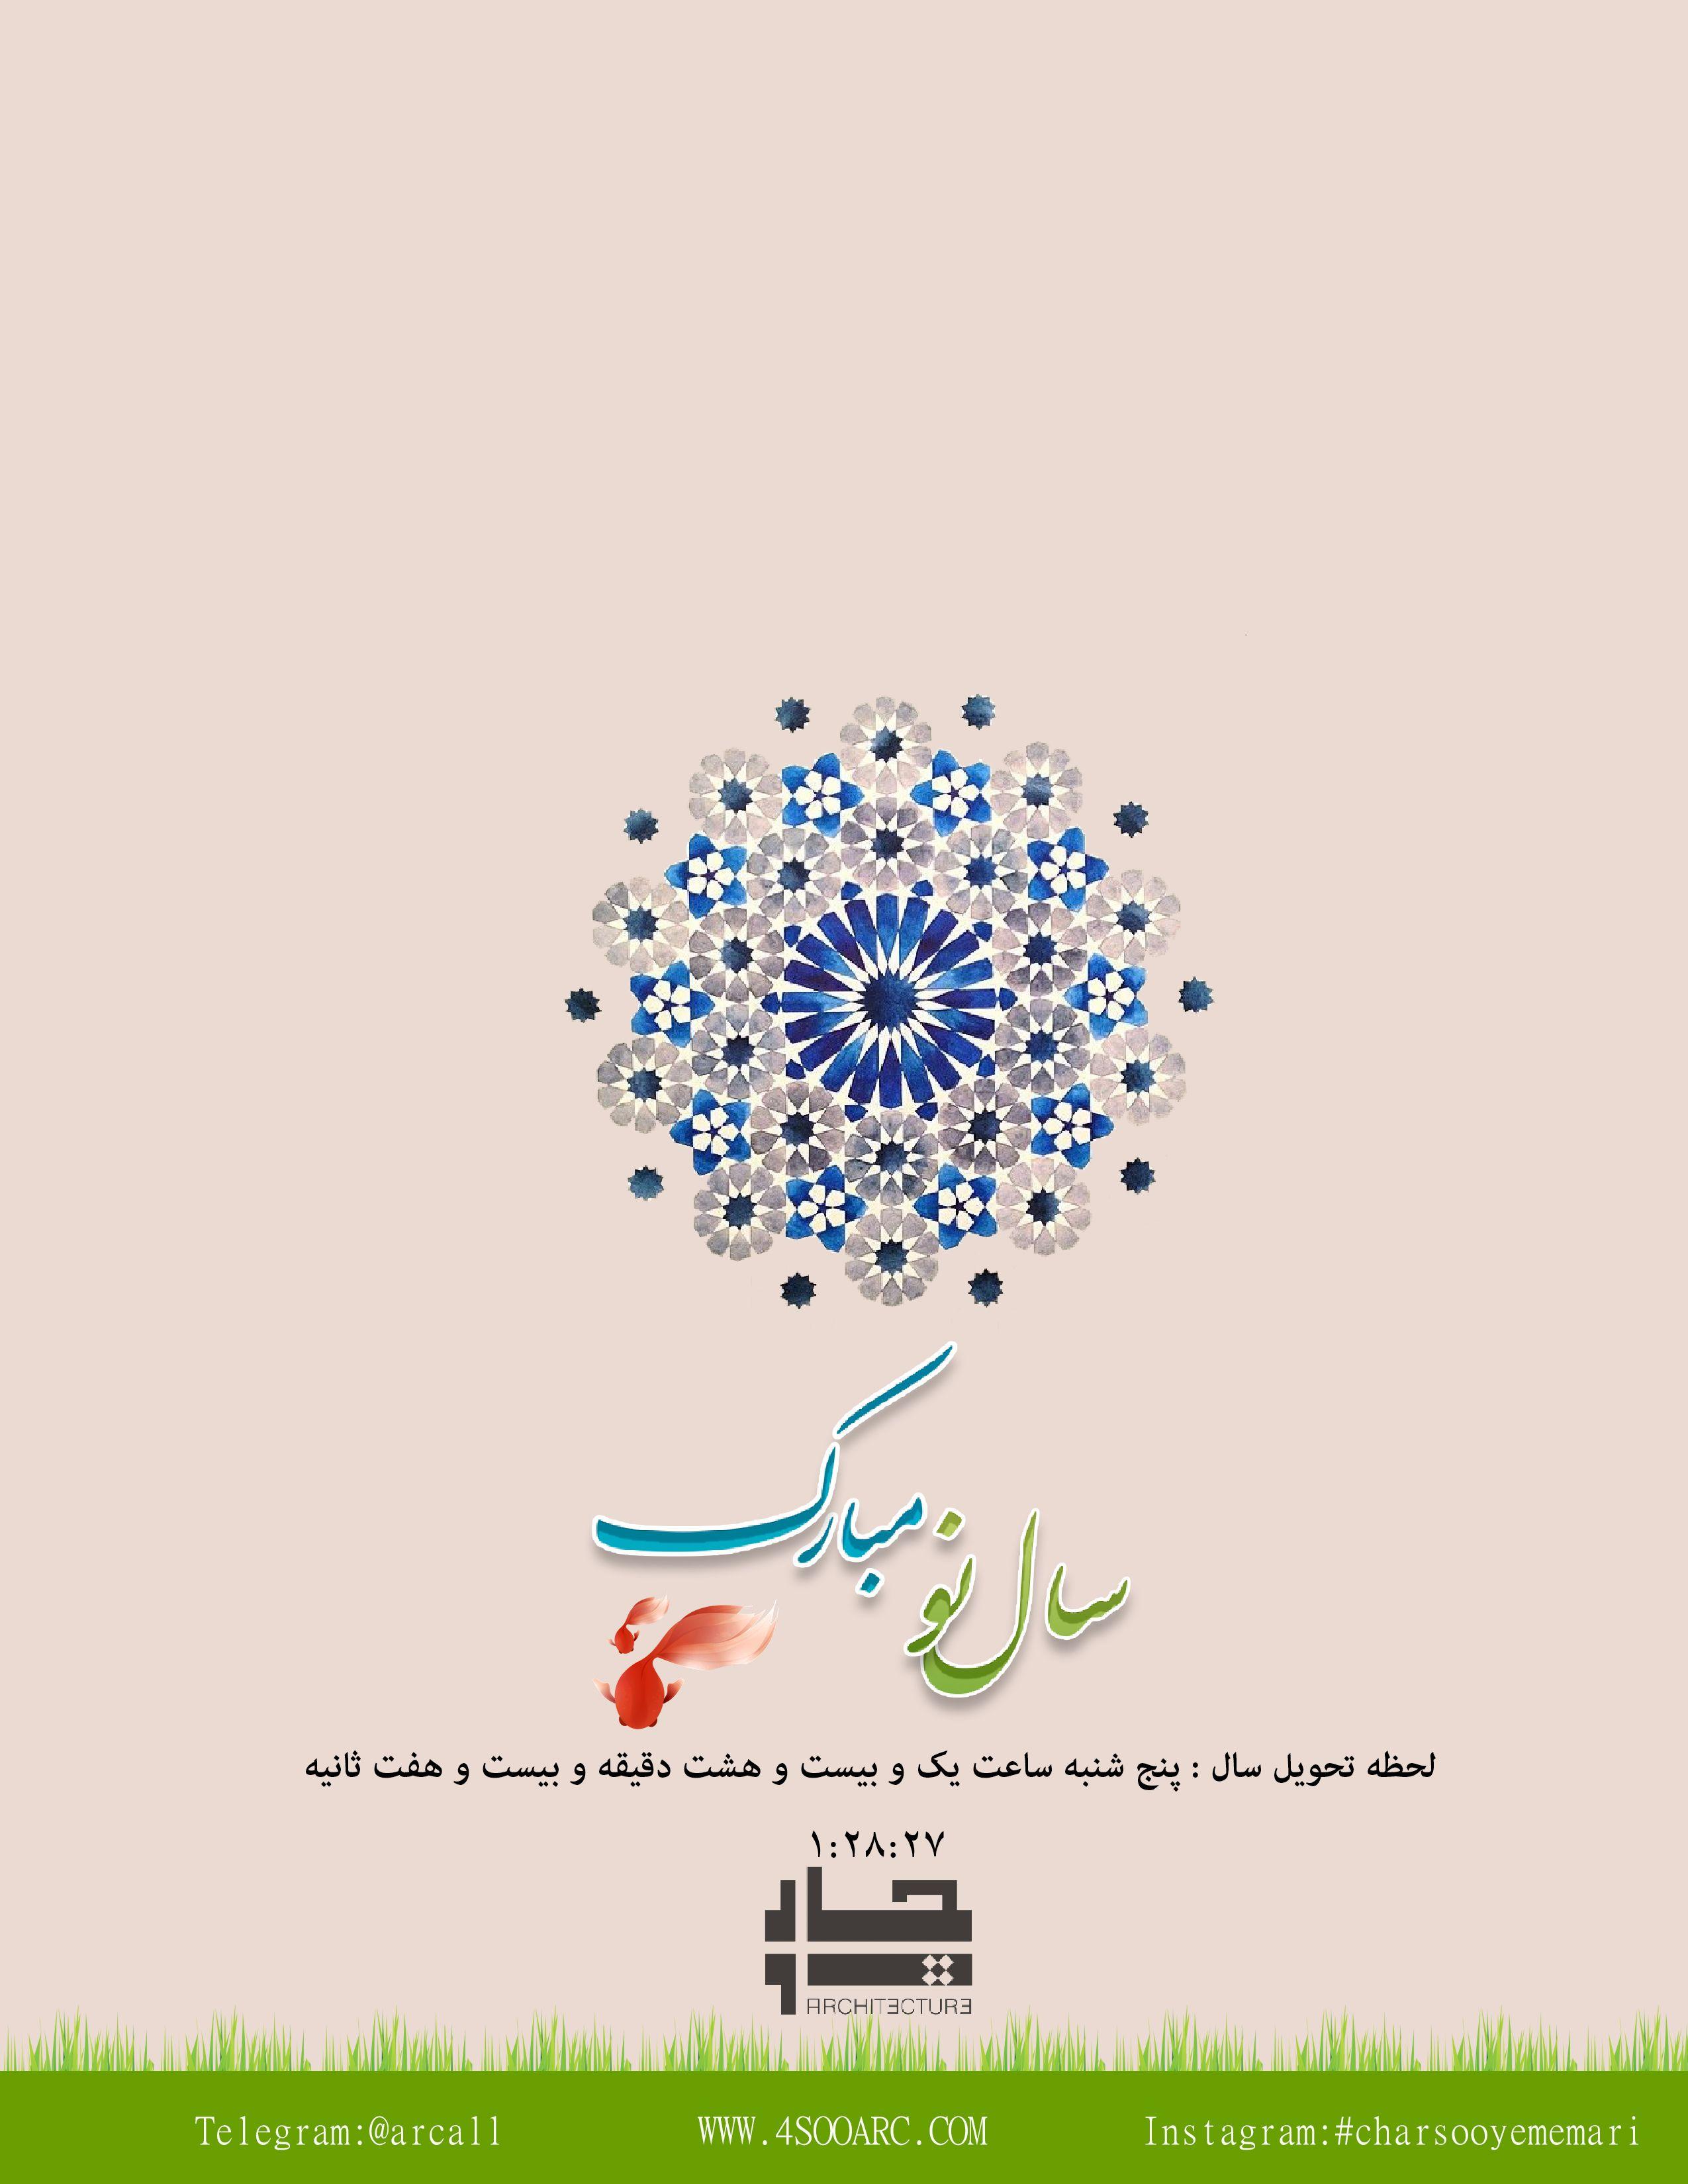 سال نو مبارک نوروز چارسوی معماری Norooz Instagram Poster